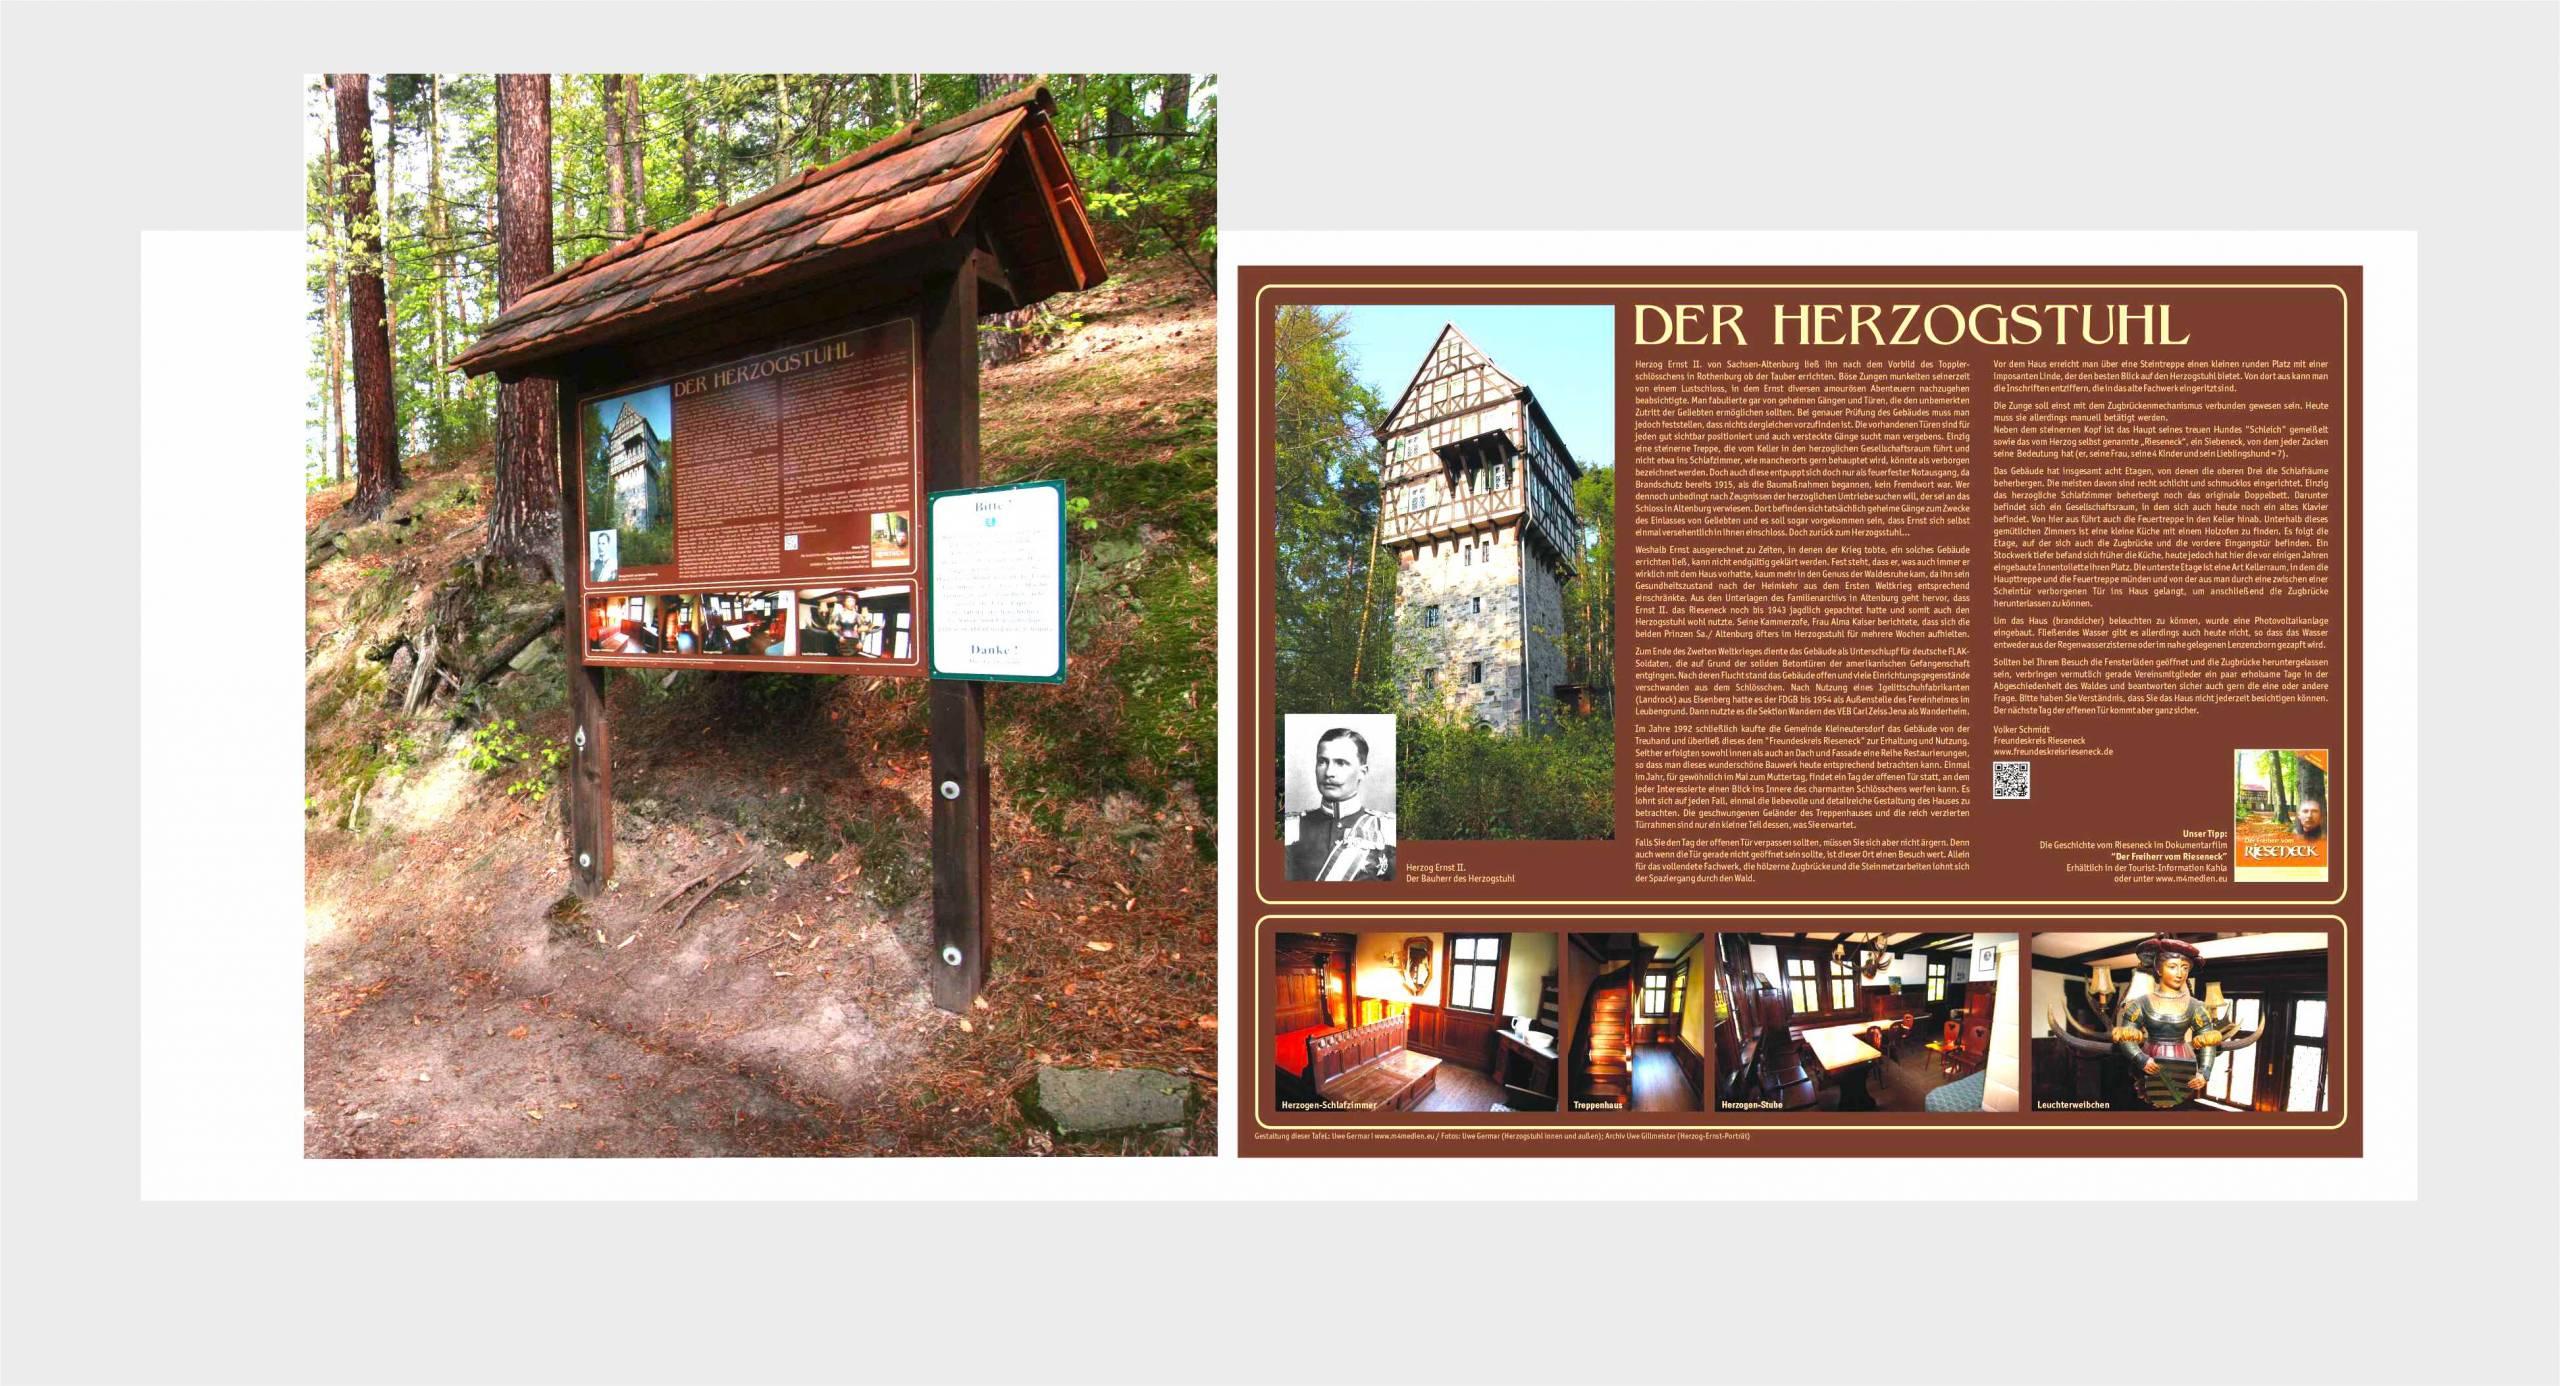 Freundeskreis Rieseneck e.V. – Touristische Info-Tafel Herzogstuhl